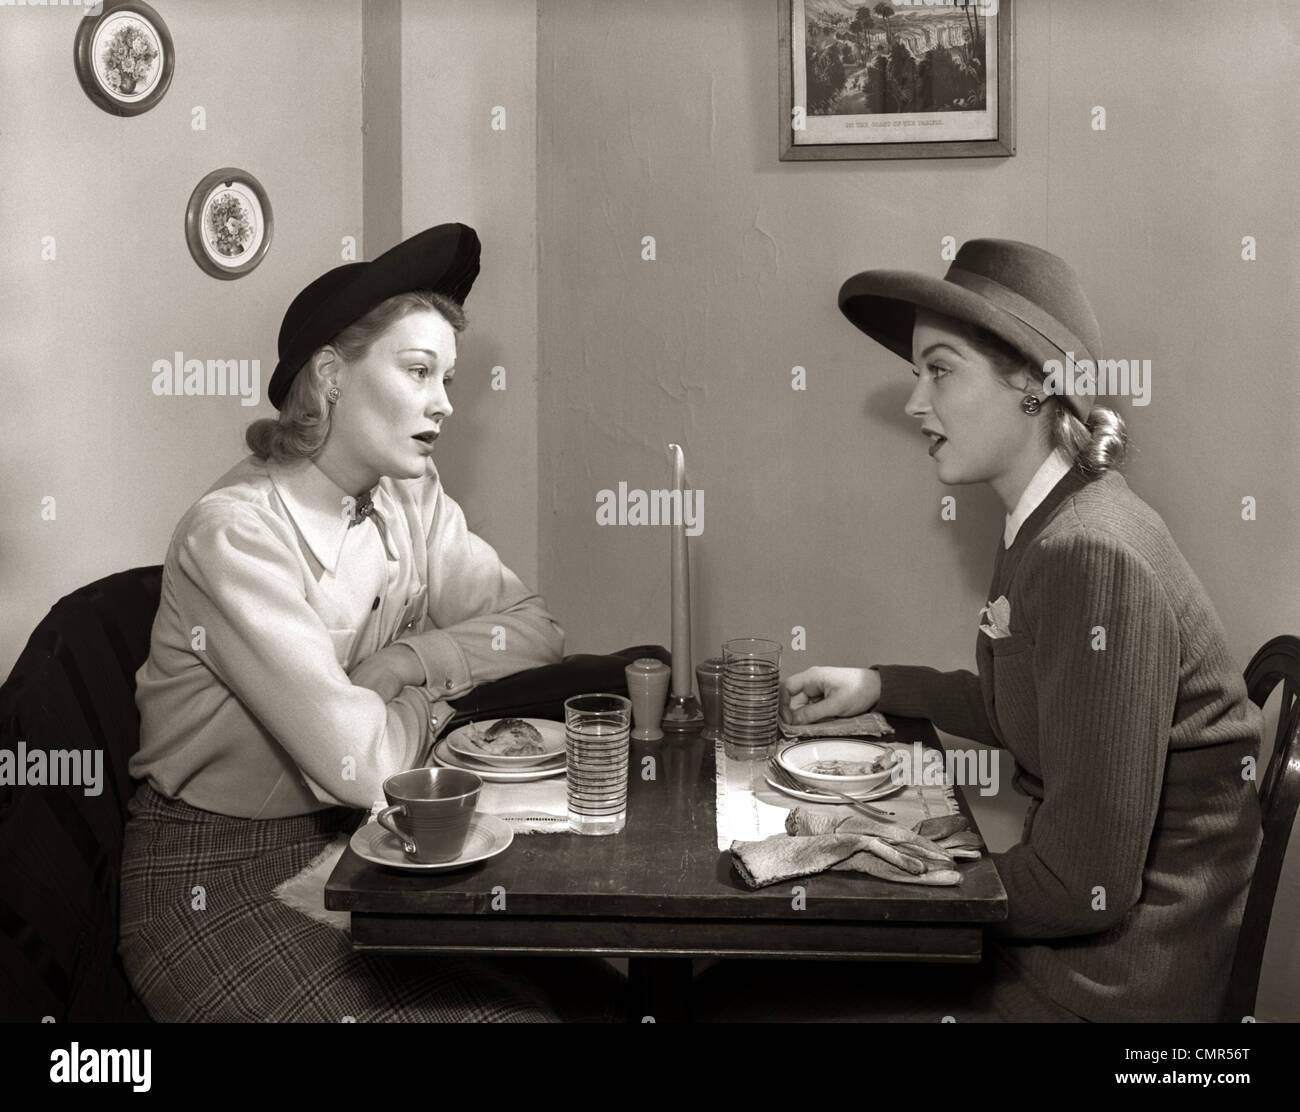 1940s 2 WOMEN DINING TALKING RESTAURANT TABLE - Stock Image